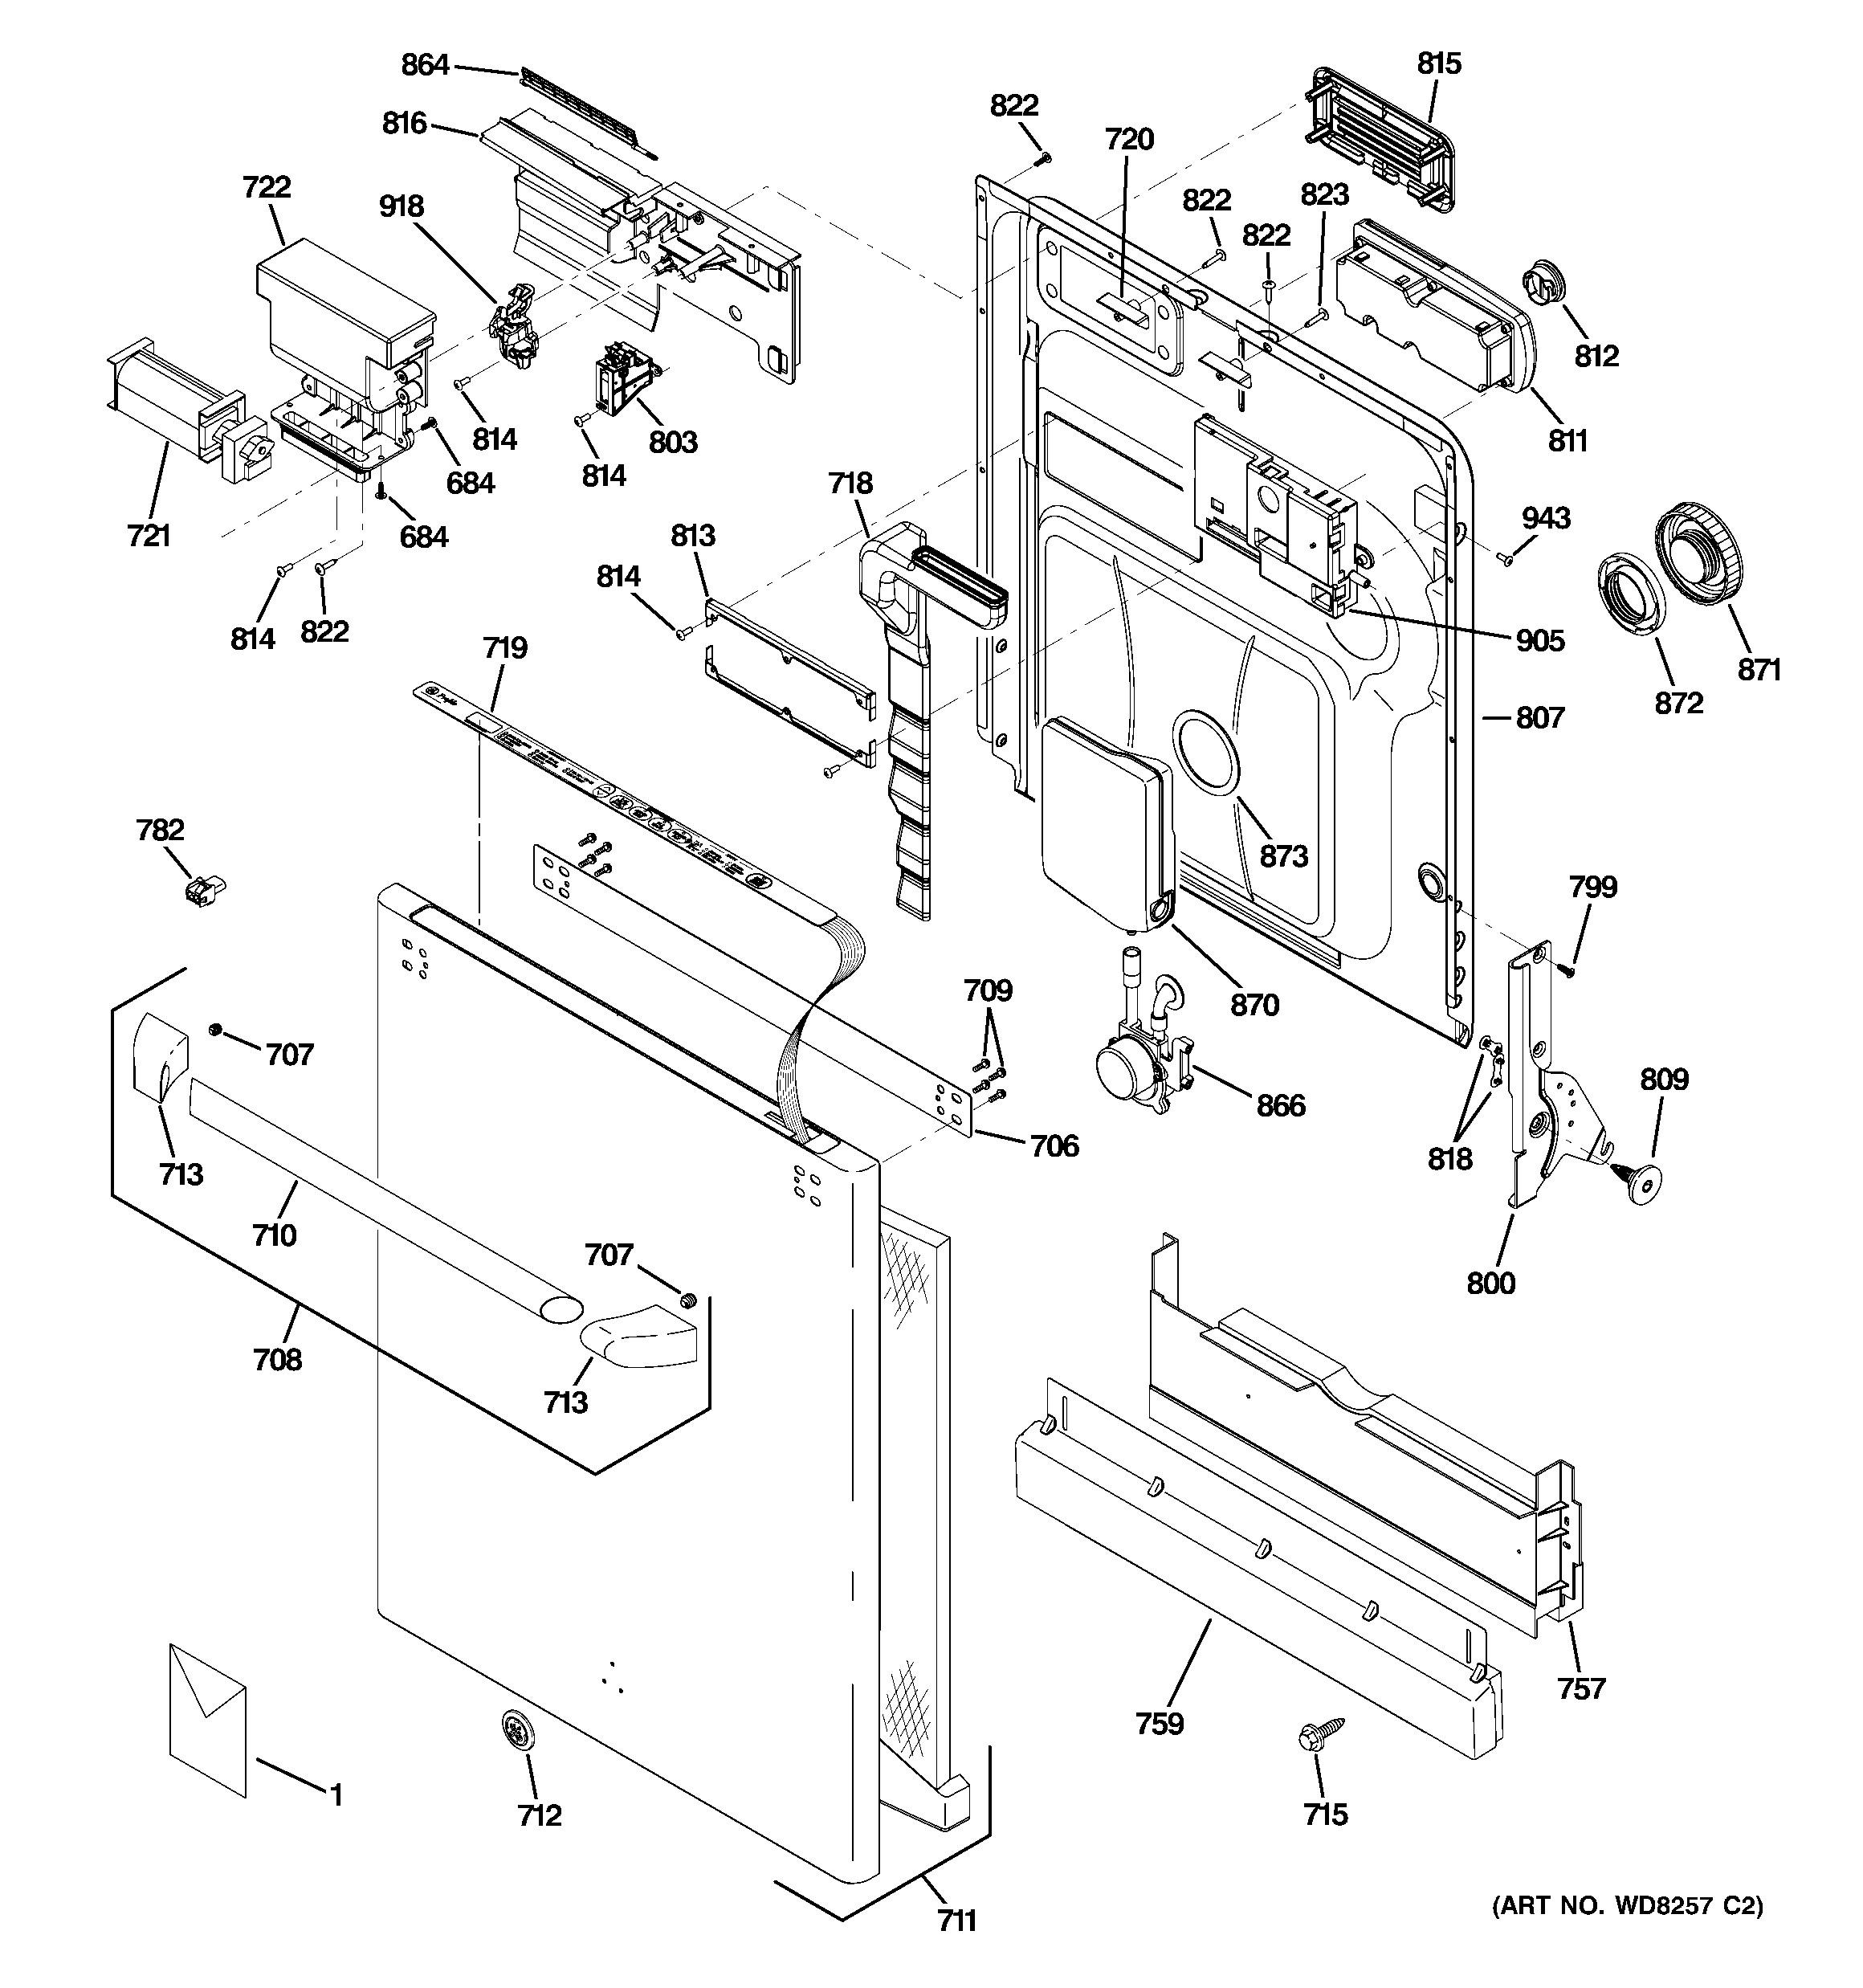 Ge Quiet Power 3 Parts Diagram Ge Model Cdw9380n00ss Dishwasher Genuine Parts Of Ge Quiet Power 3 Parts Diagram